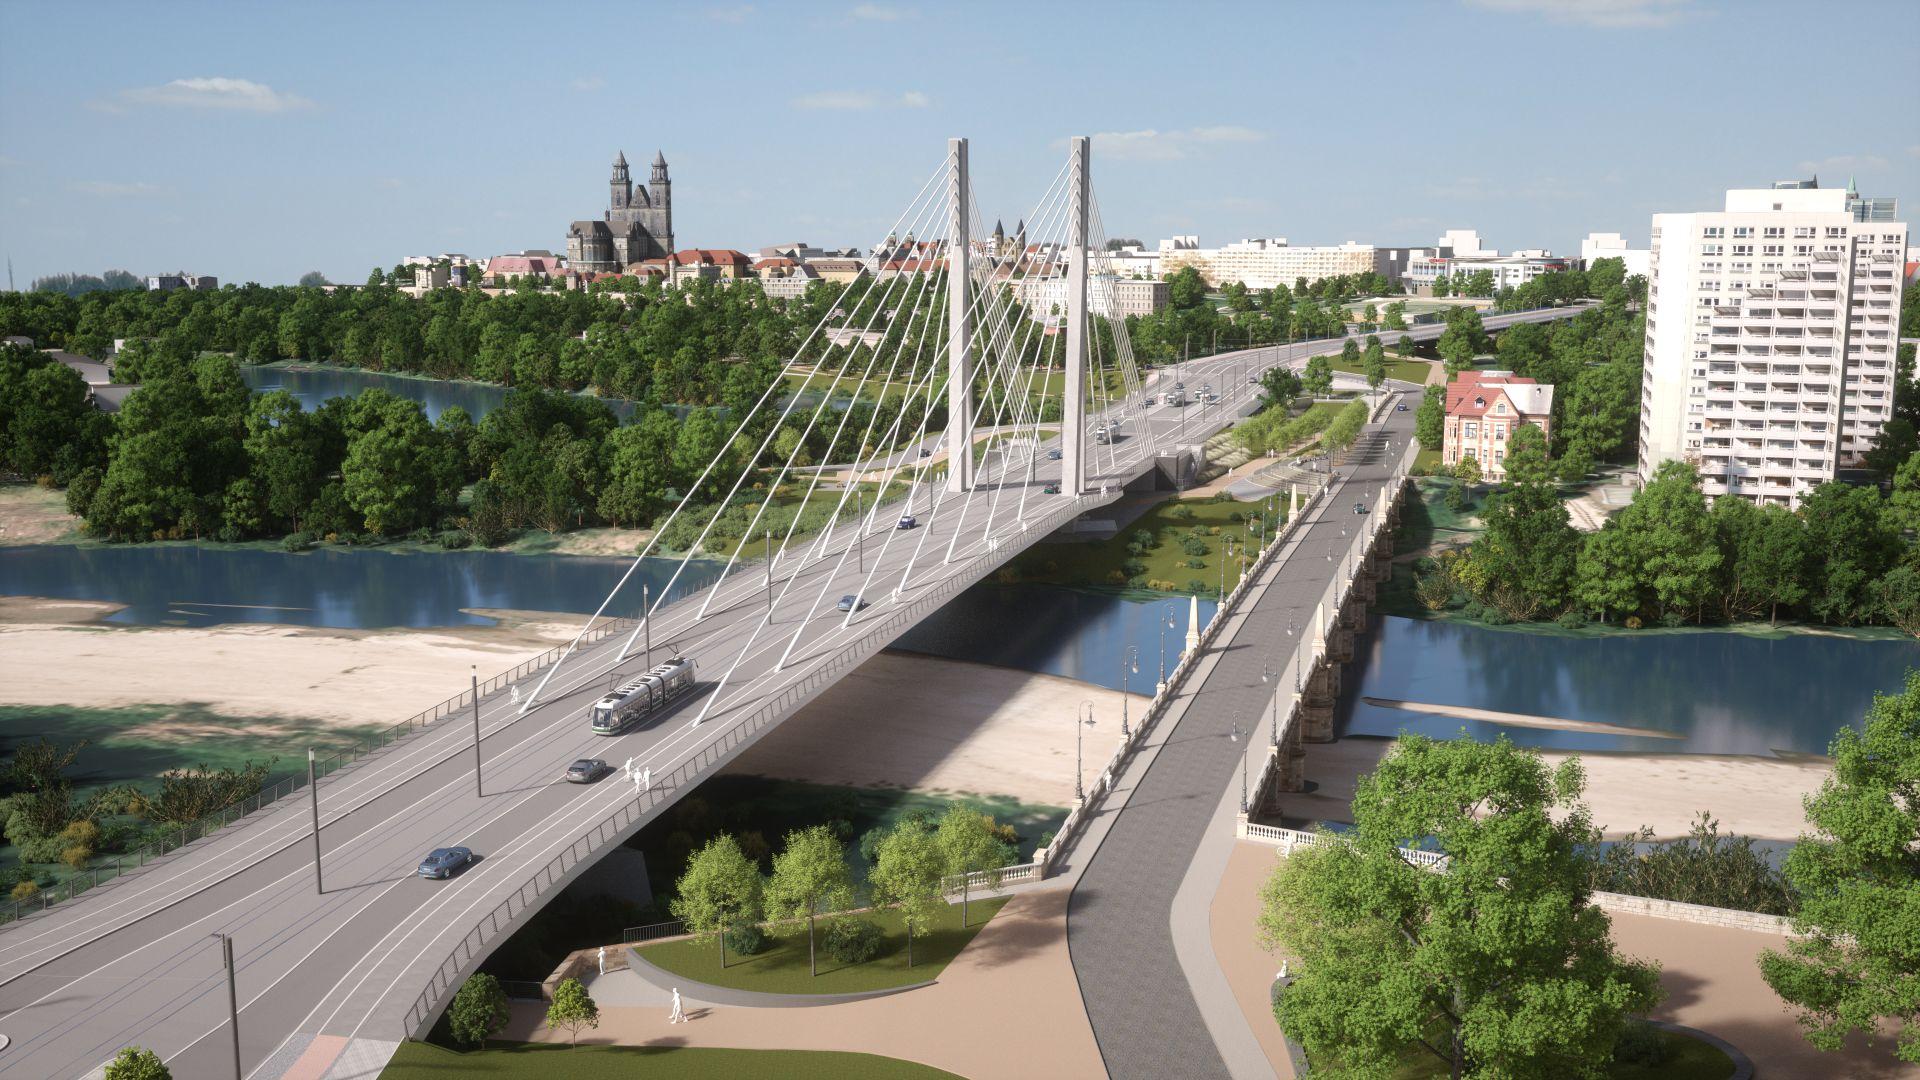 Strombrückenzug_Magdeburg_klein